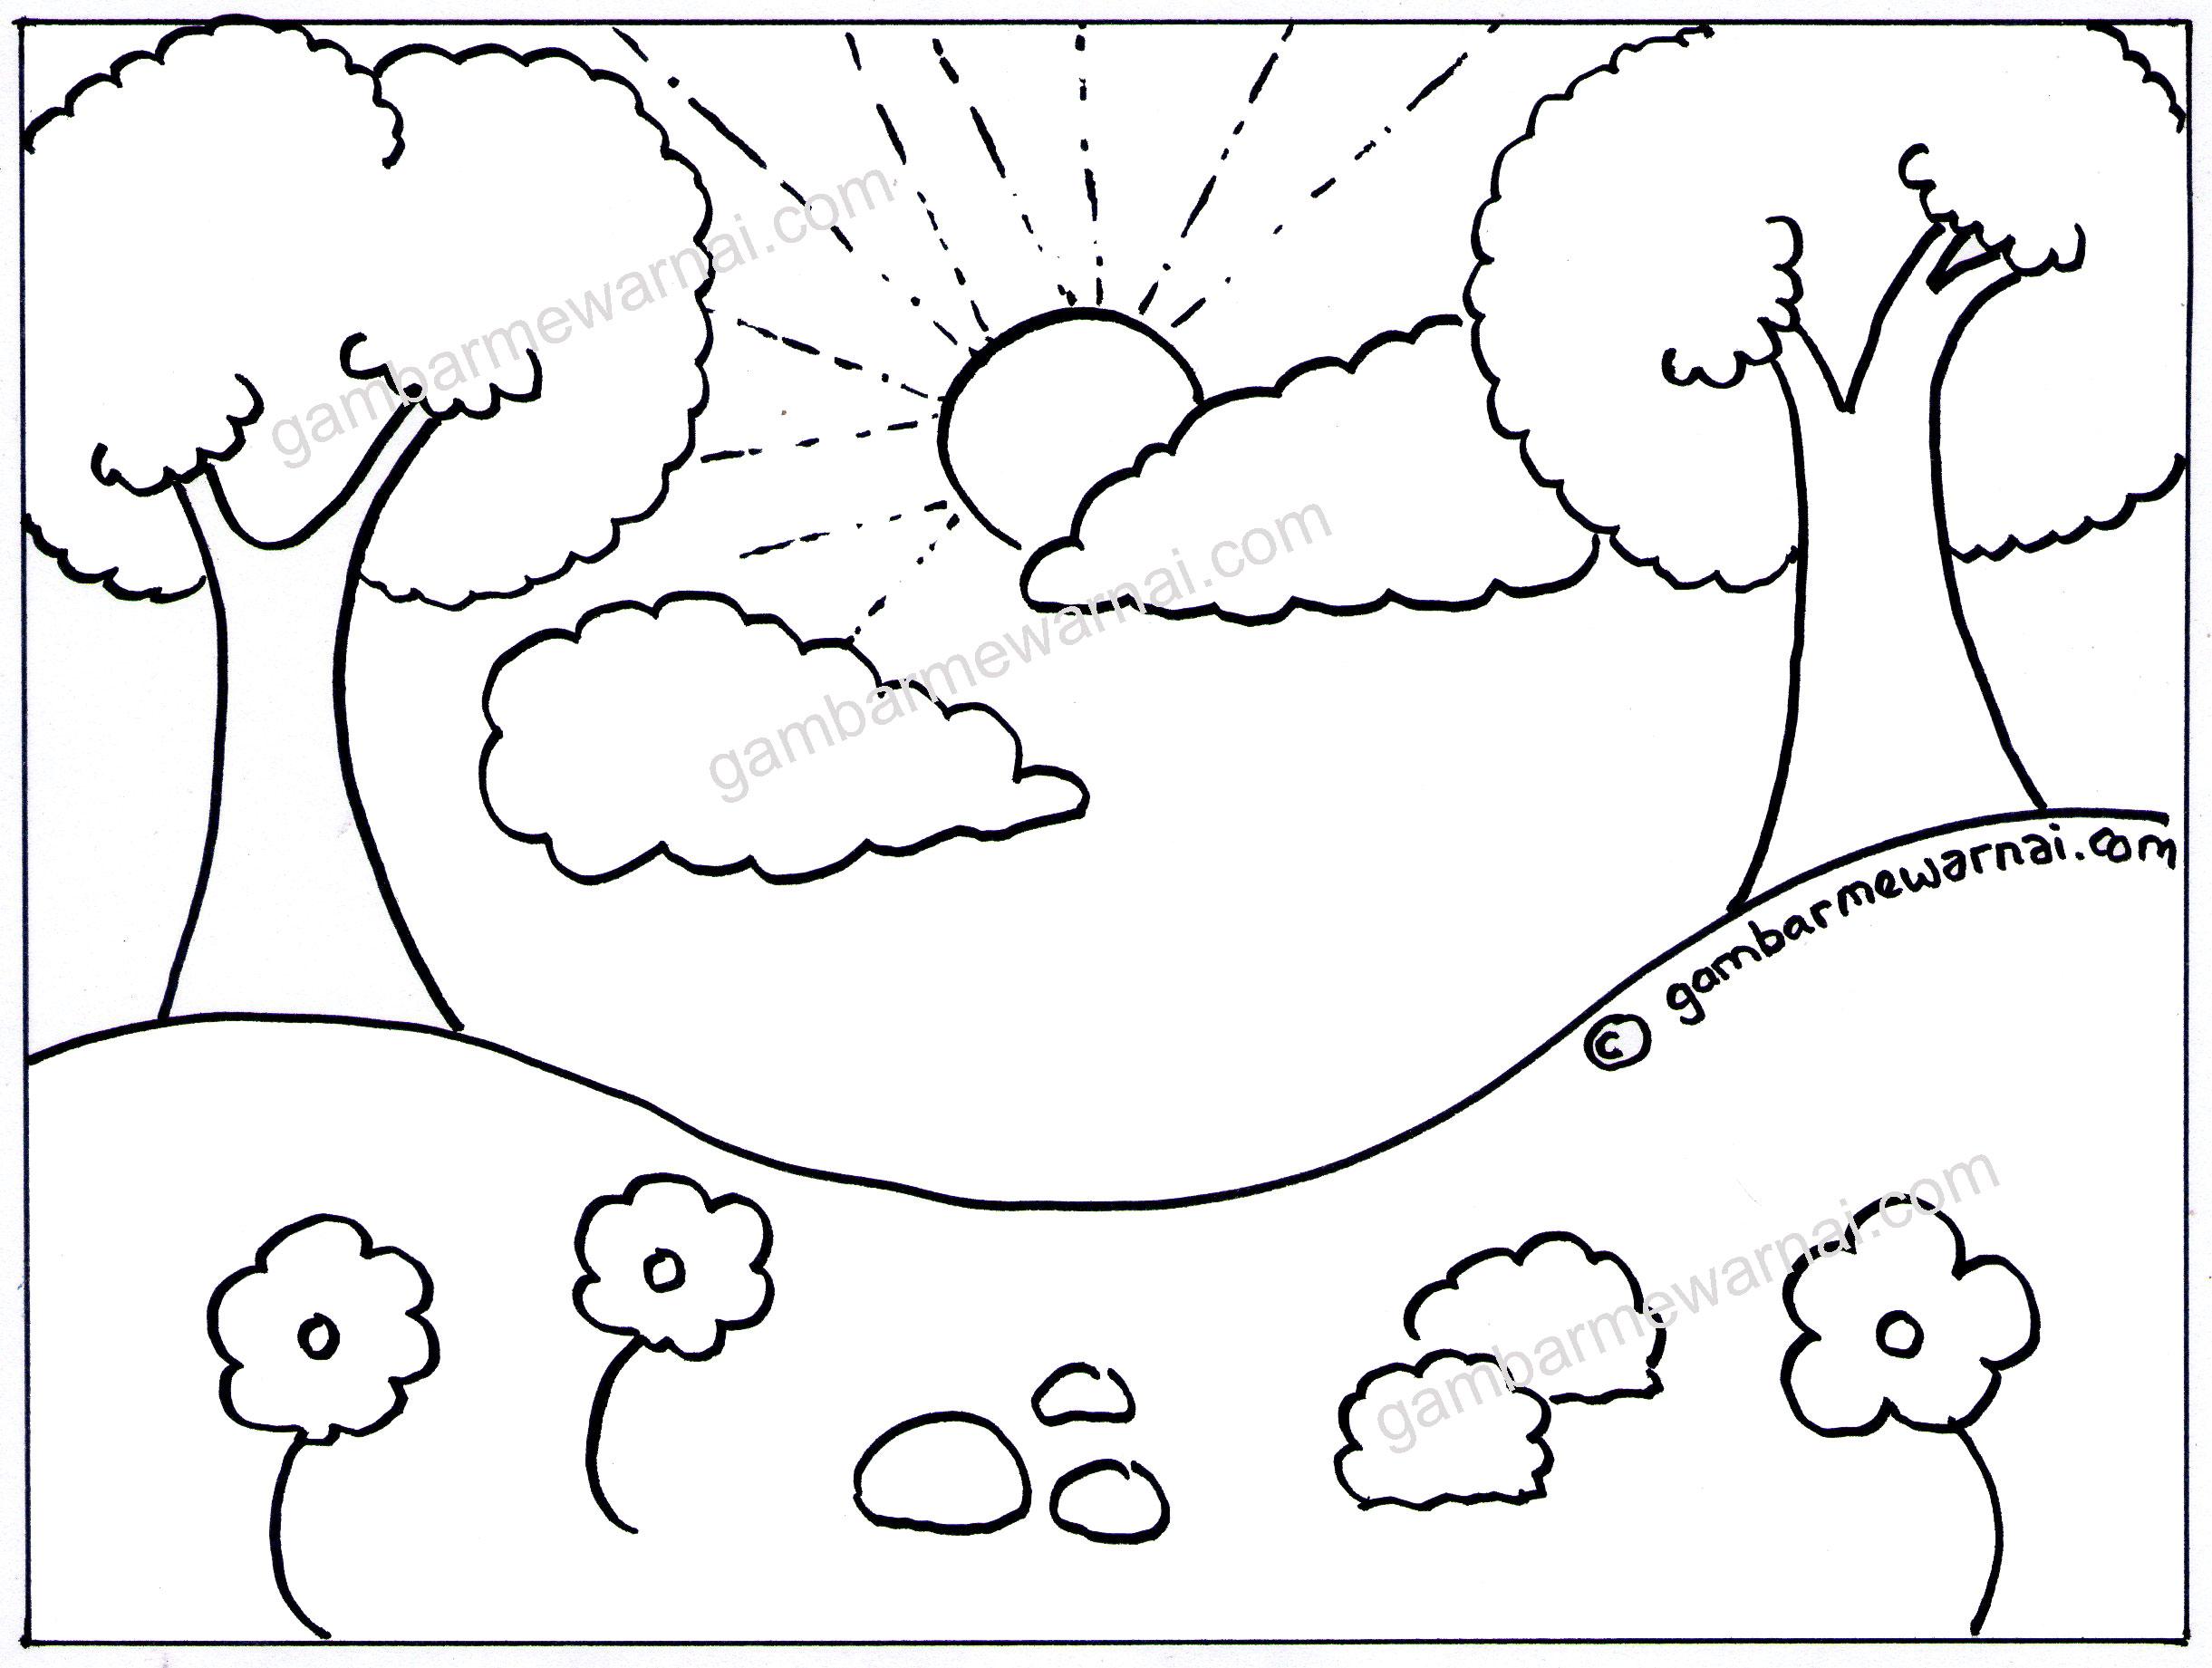 Gambar Pemandangan Sawah Kartun